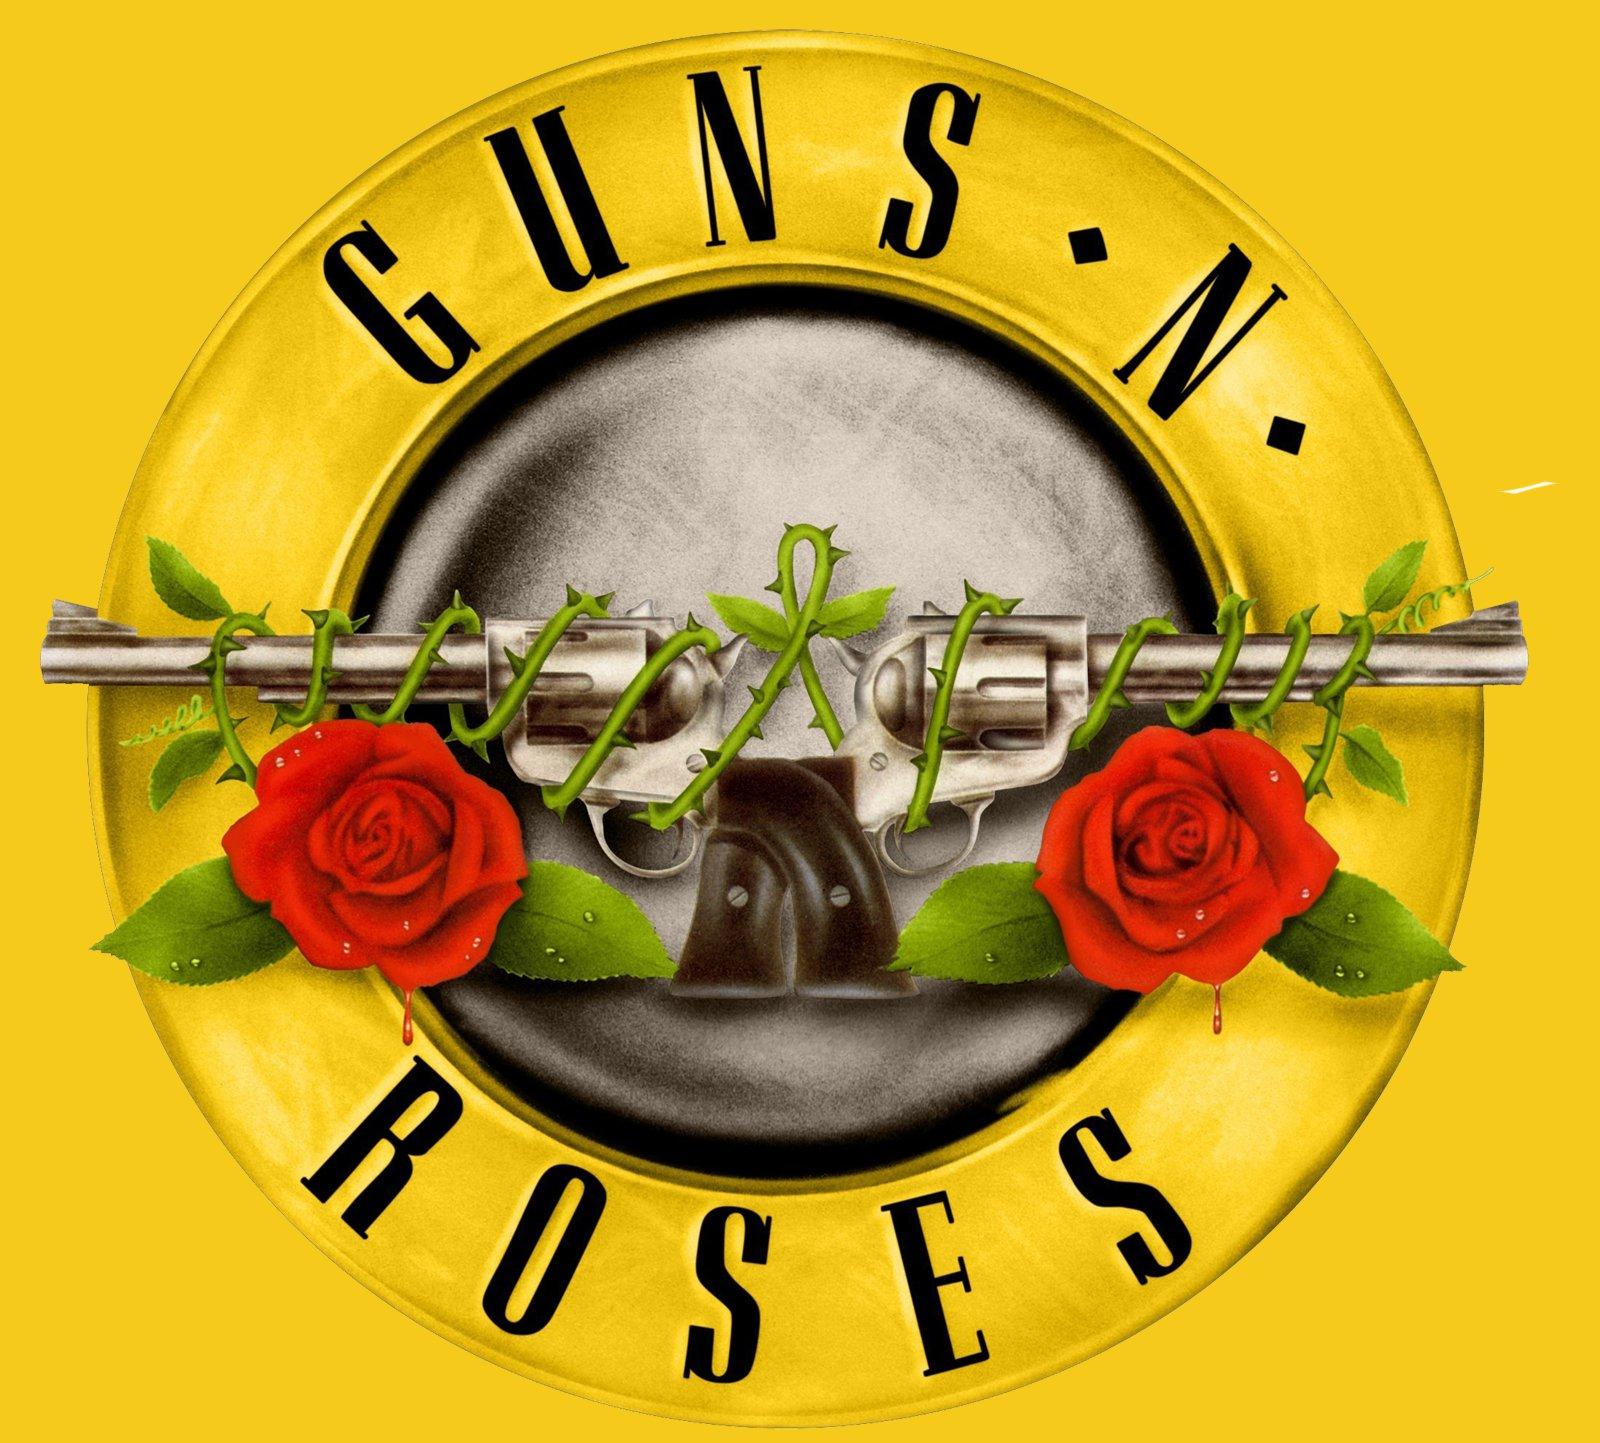 Guns Rouses